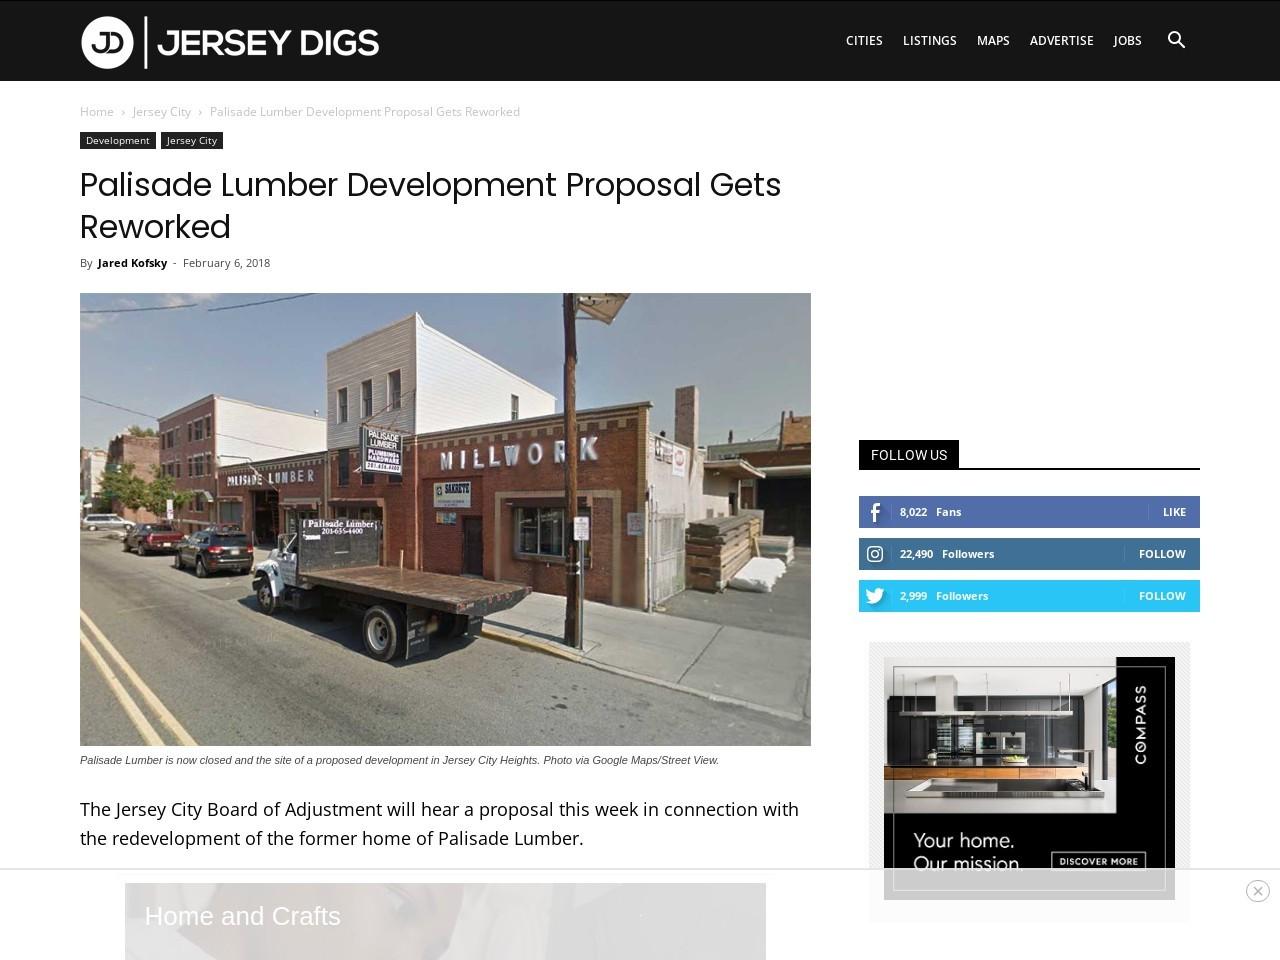 Palisade Lumber Development Proposal Gets Reworked